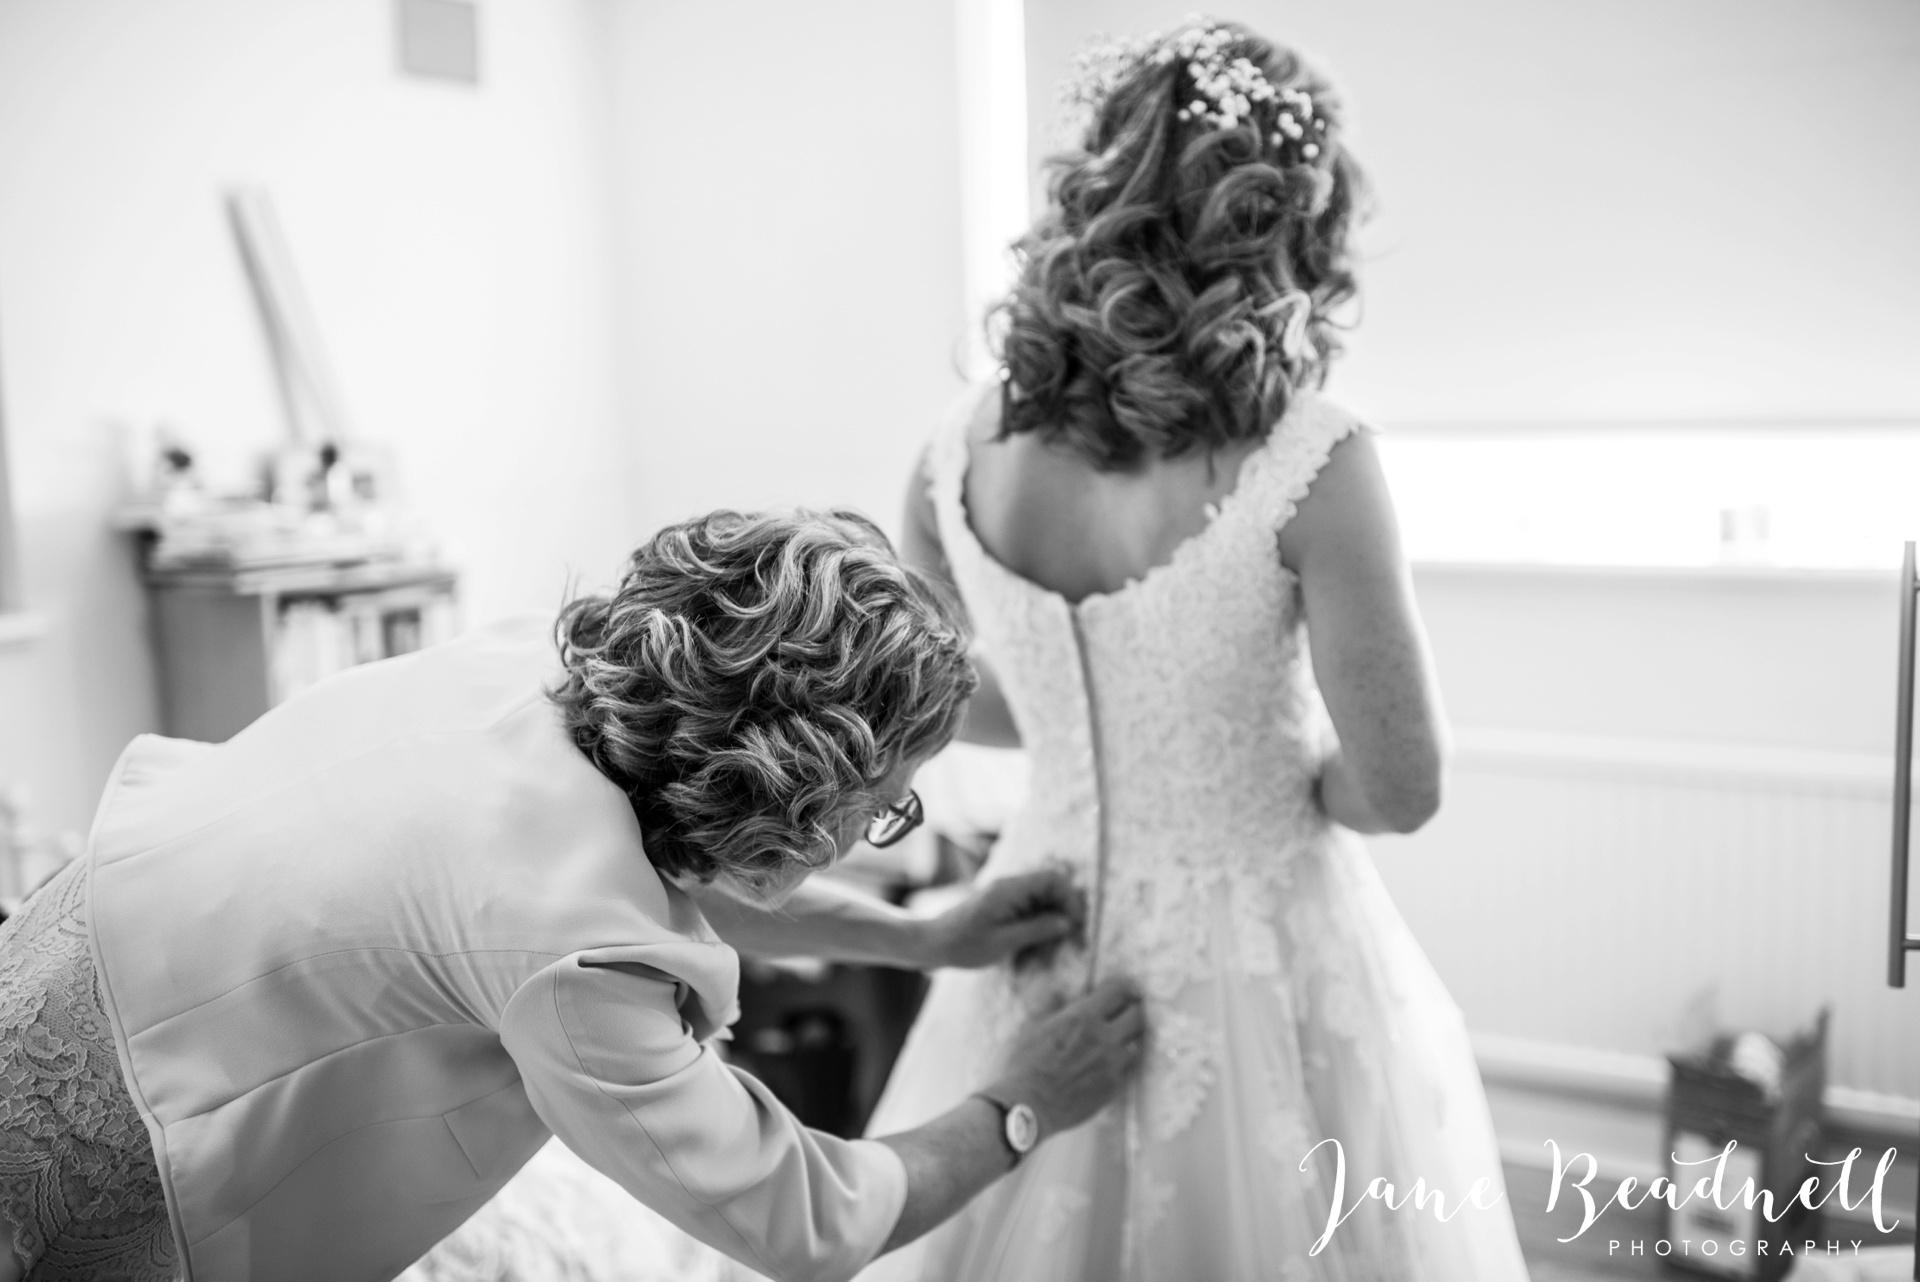 yorkshire-fine-art-wedding-photographer-jane-beadnell-photography-poppleton-york_0005